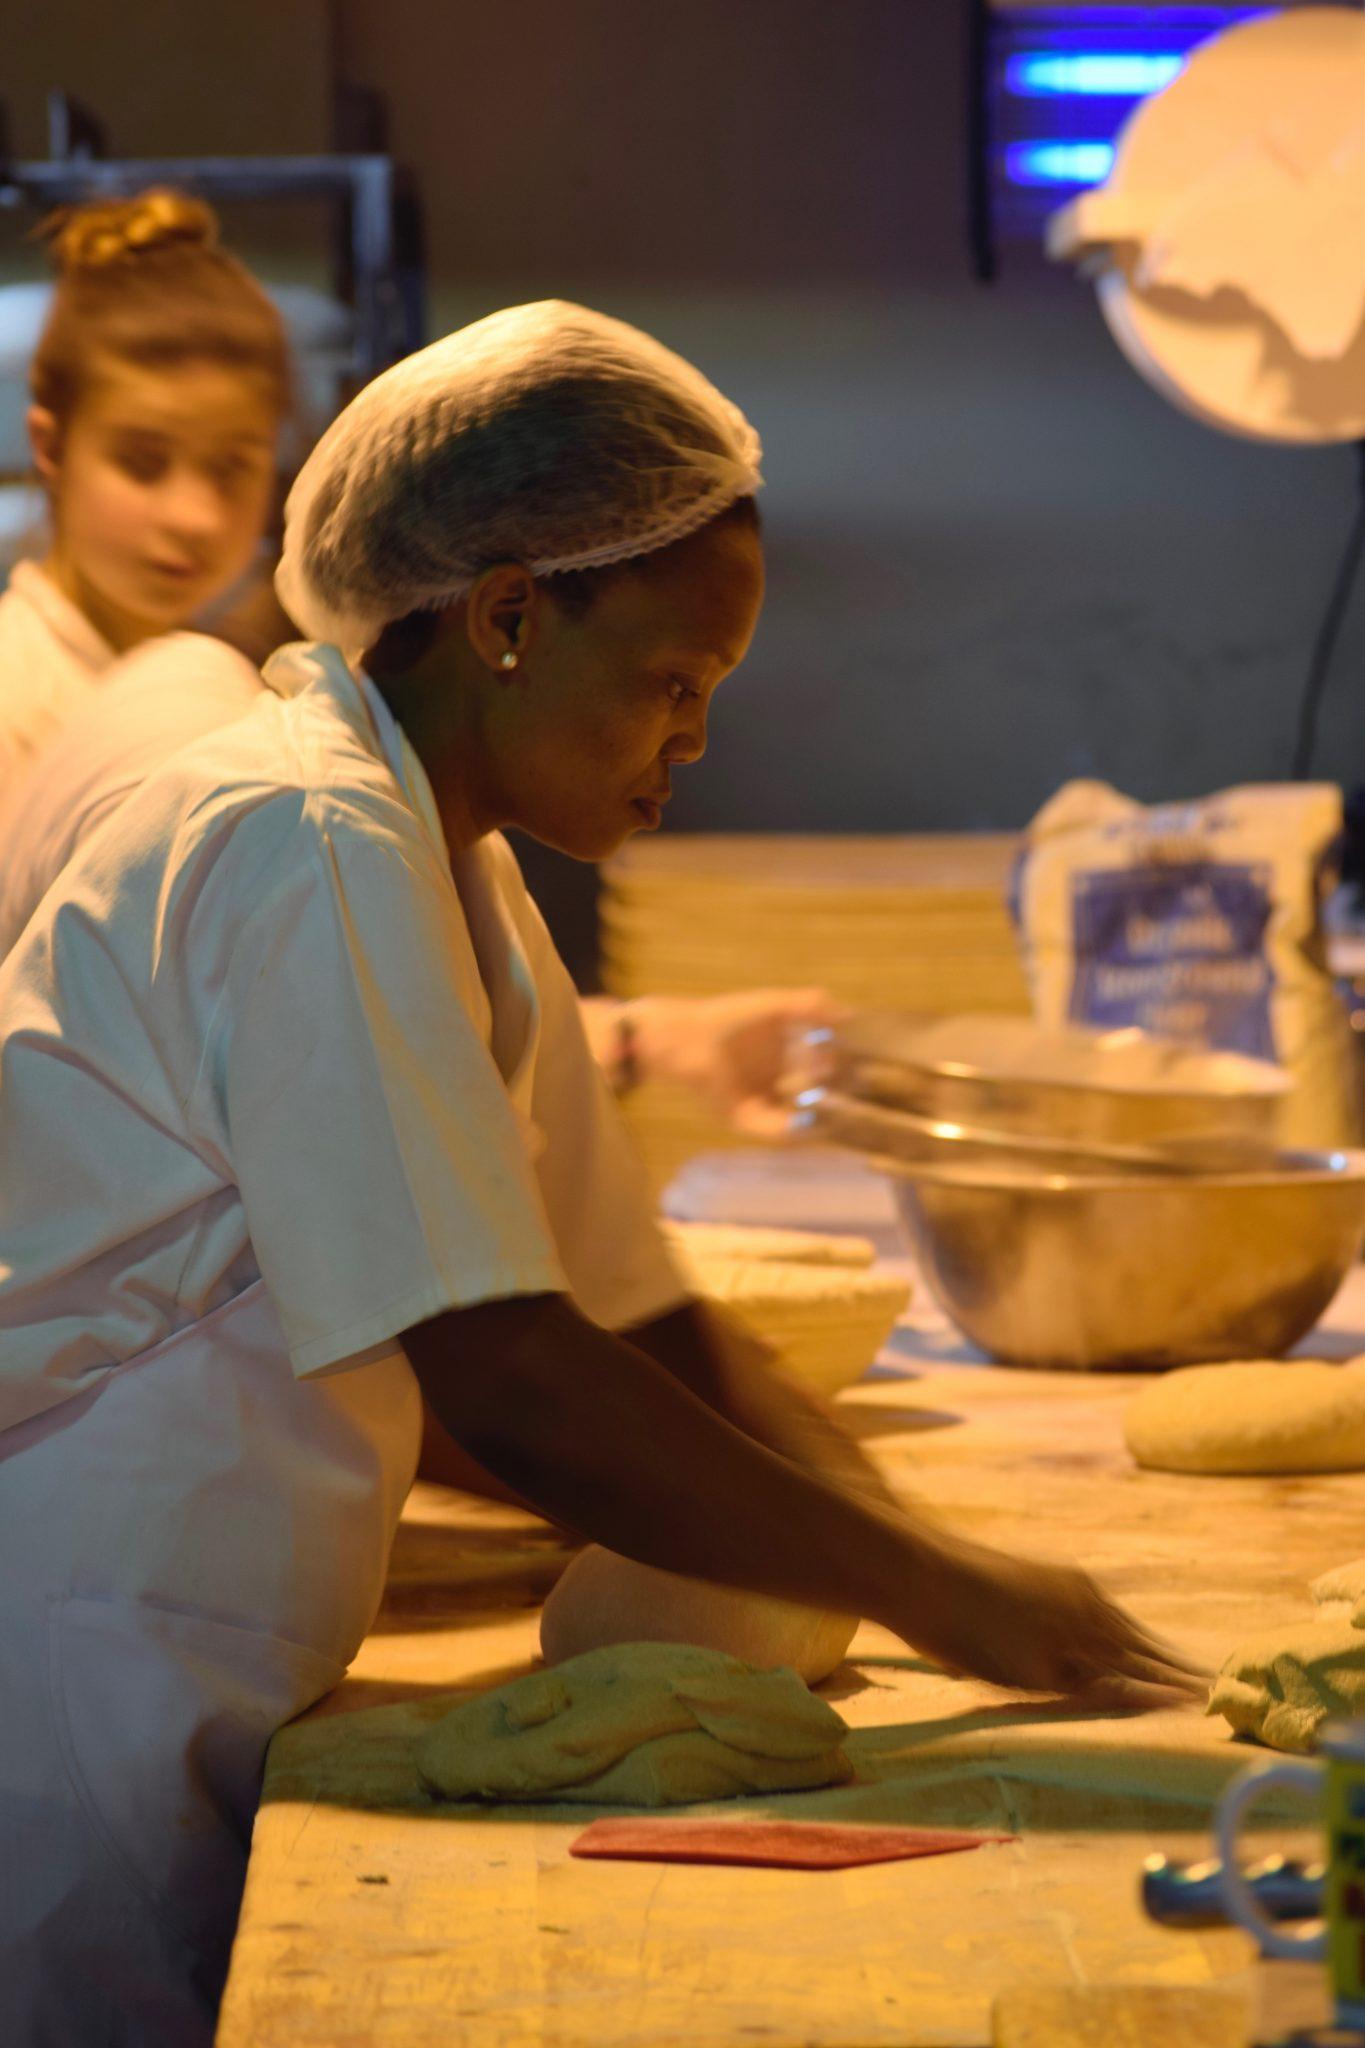 Stellenbosch-bakery-woman-kneading